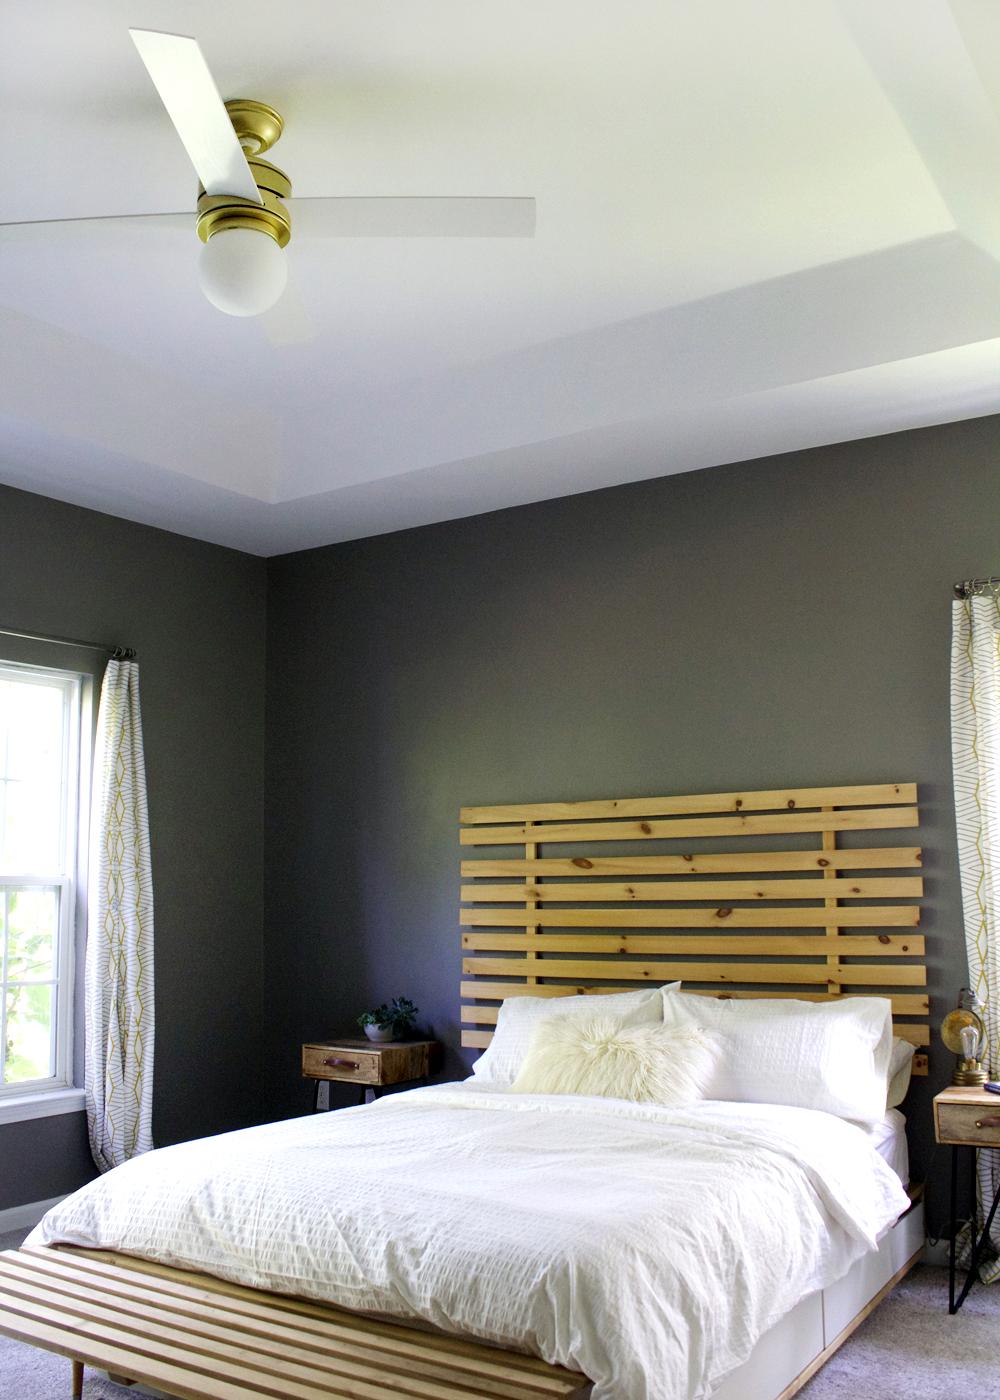 Hunter Fan Hepburn: A Modern Ceiling Fan Upgrade For Under $200 | Tagu0026tibby